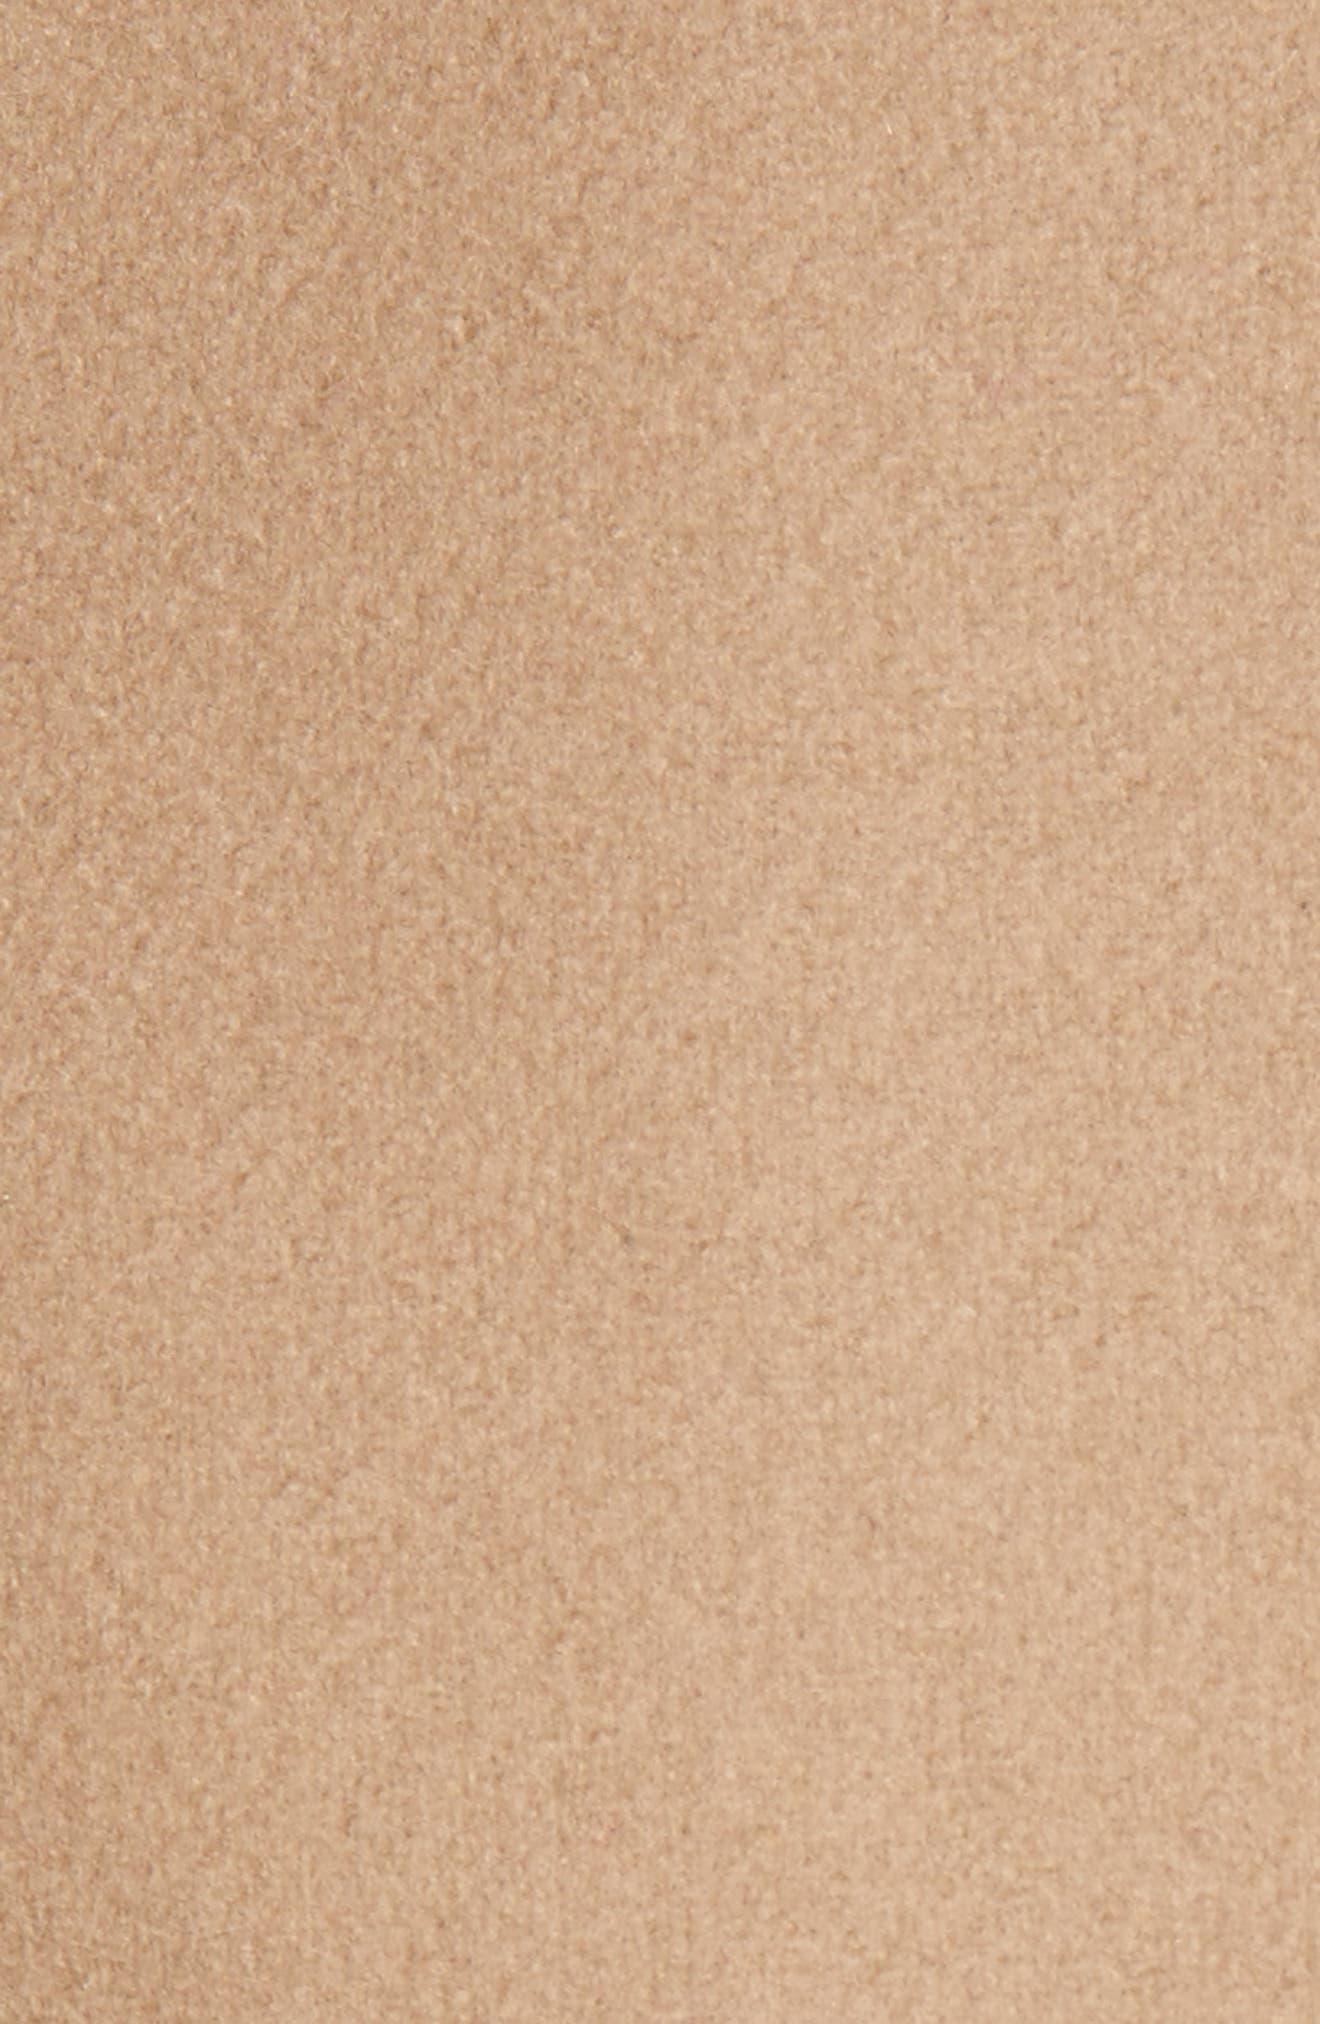 Wool Blend Short Wrap Coat,                             Alternate thumbnail 6, color,                             271